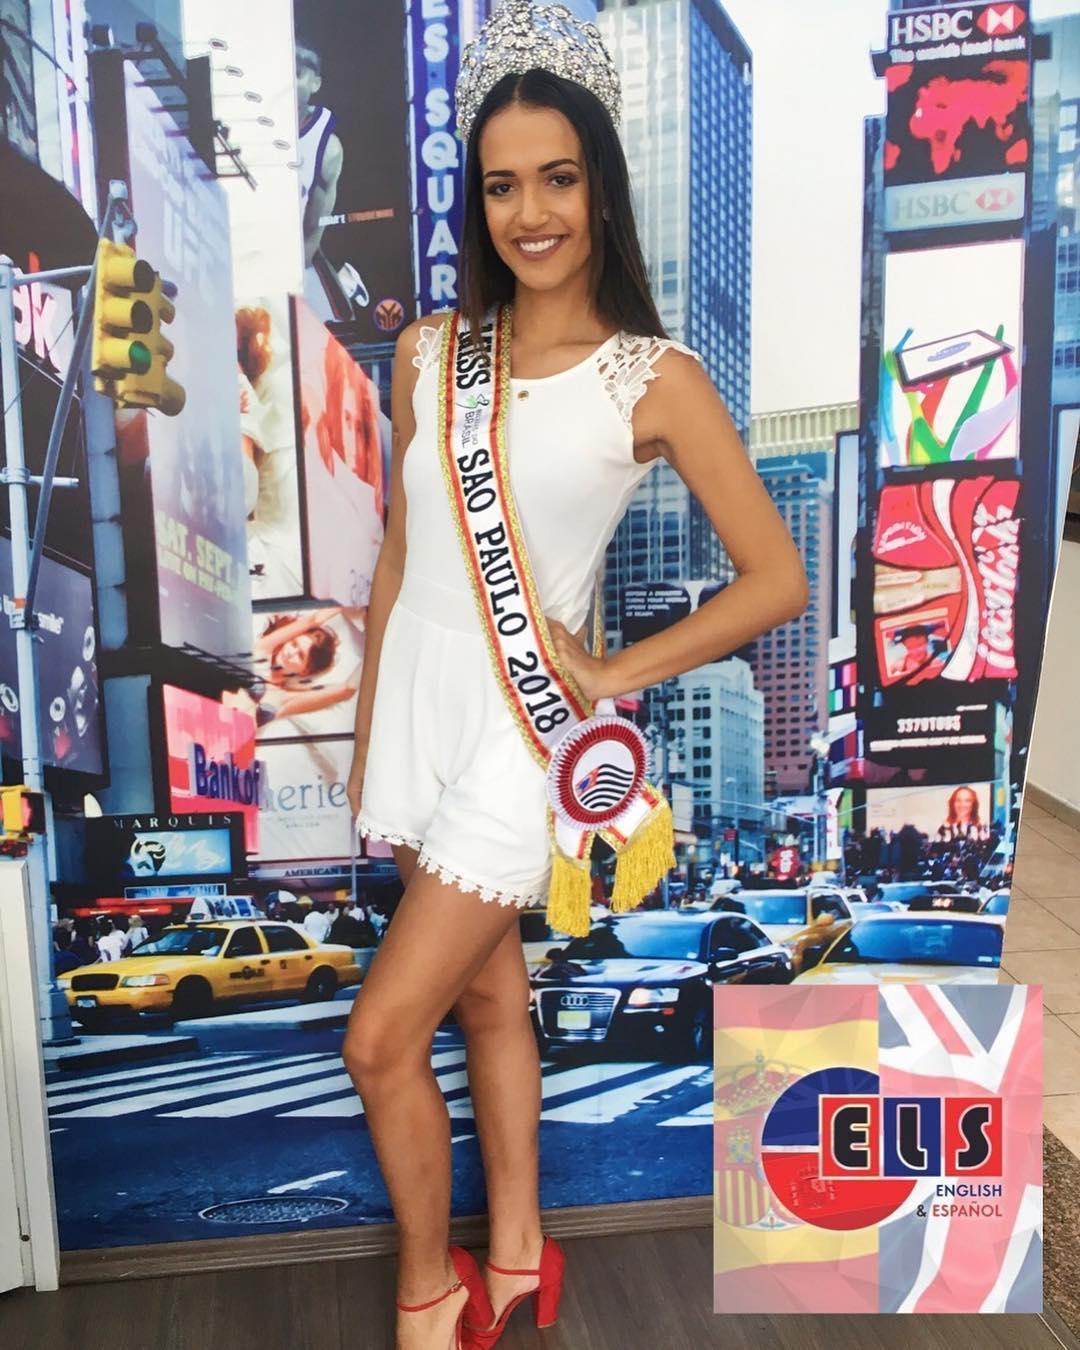 flavia polido, miss brasil intercontinental 2018-2019. - Página 2 30830110